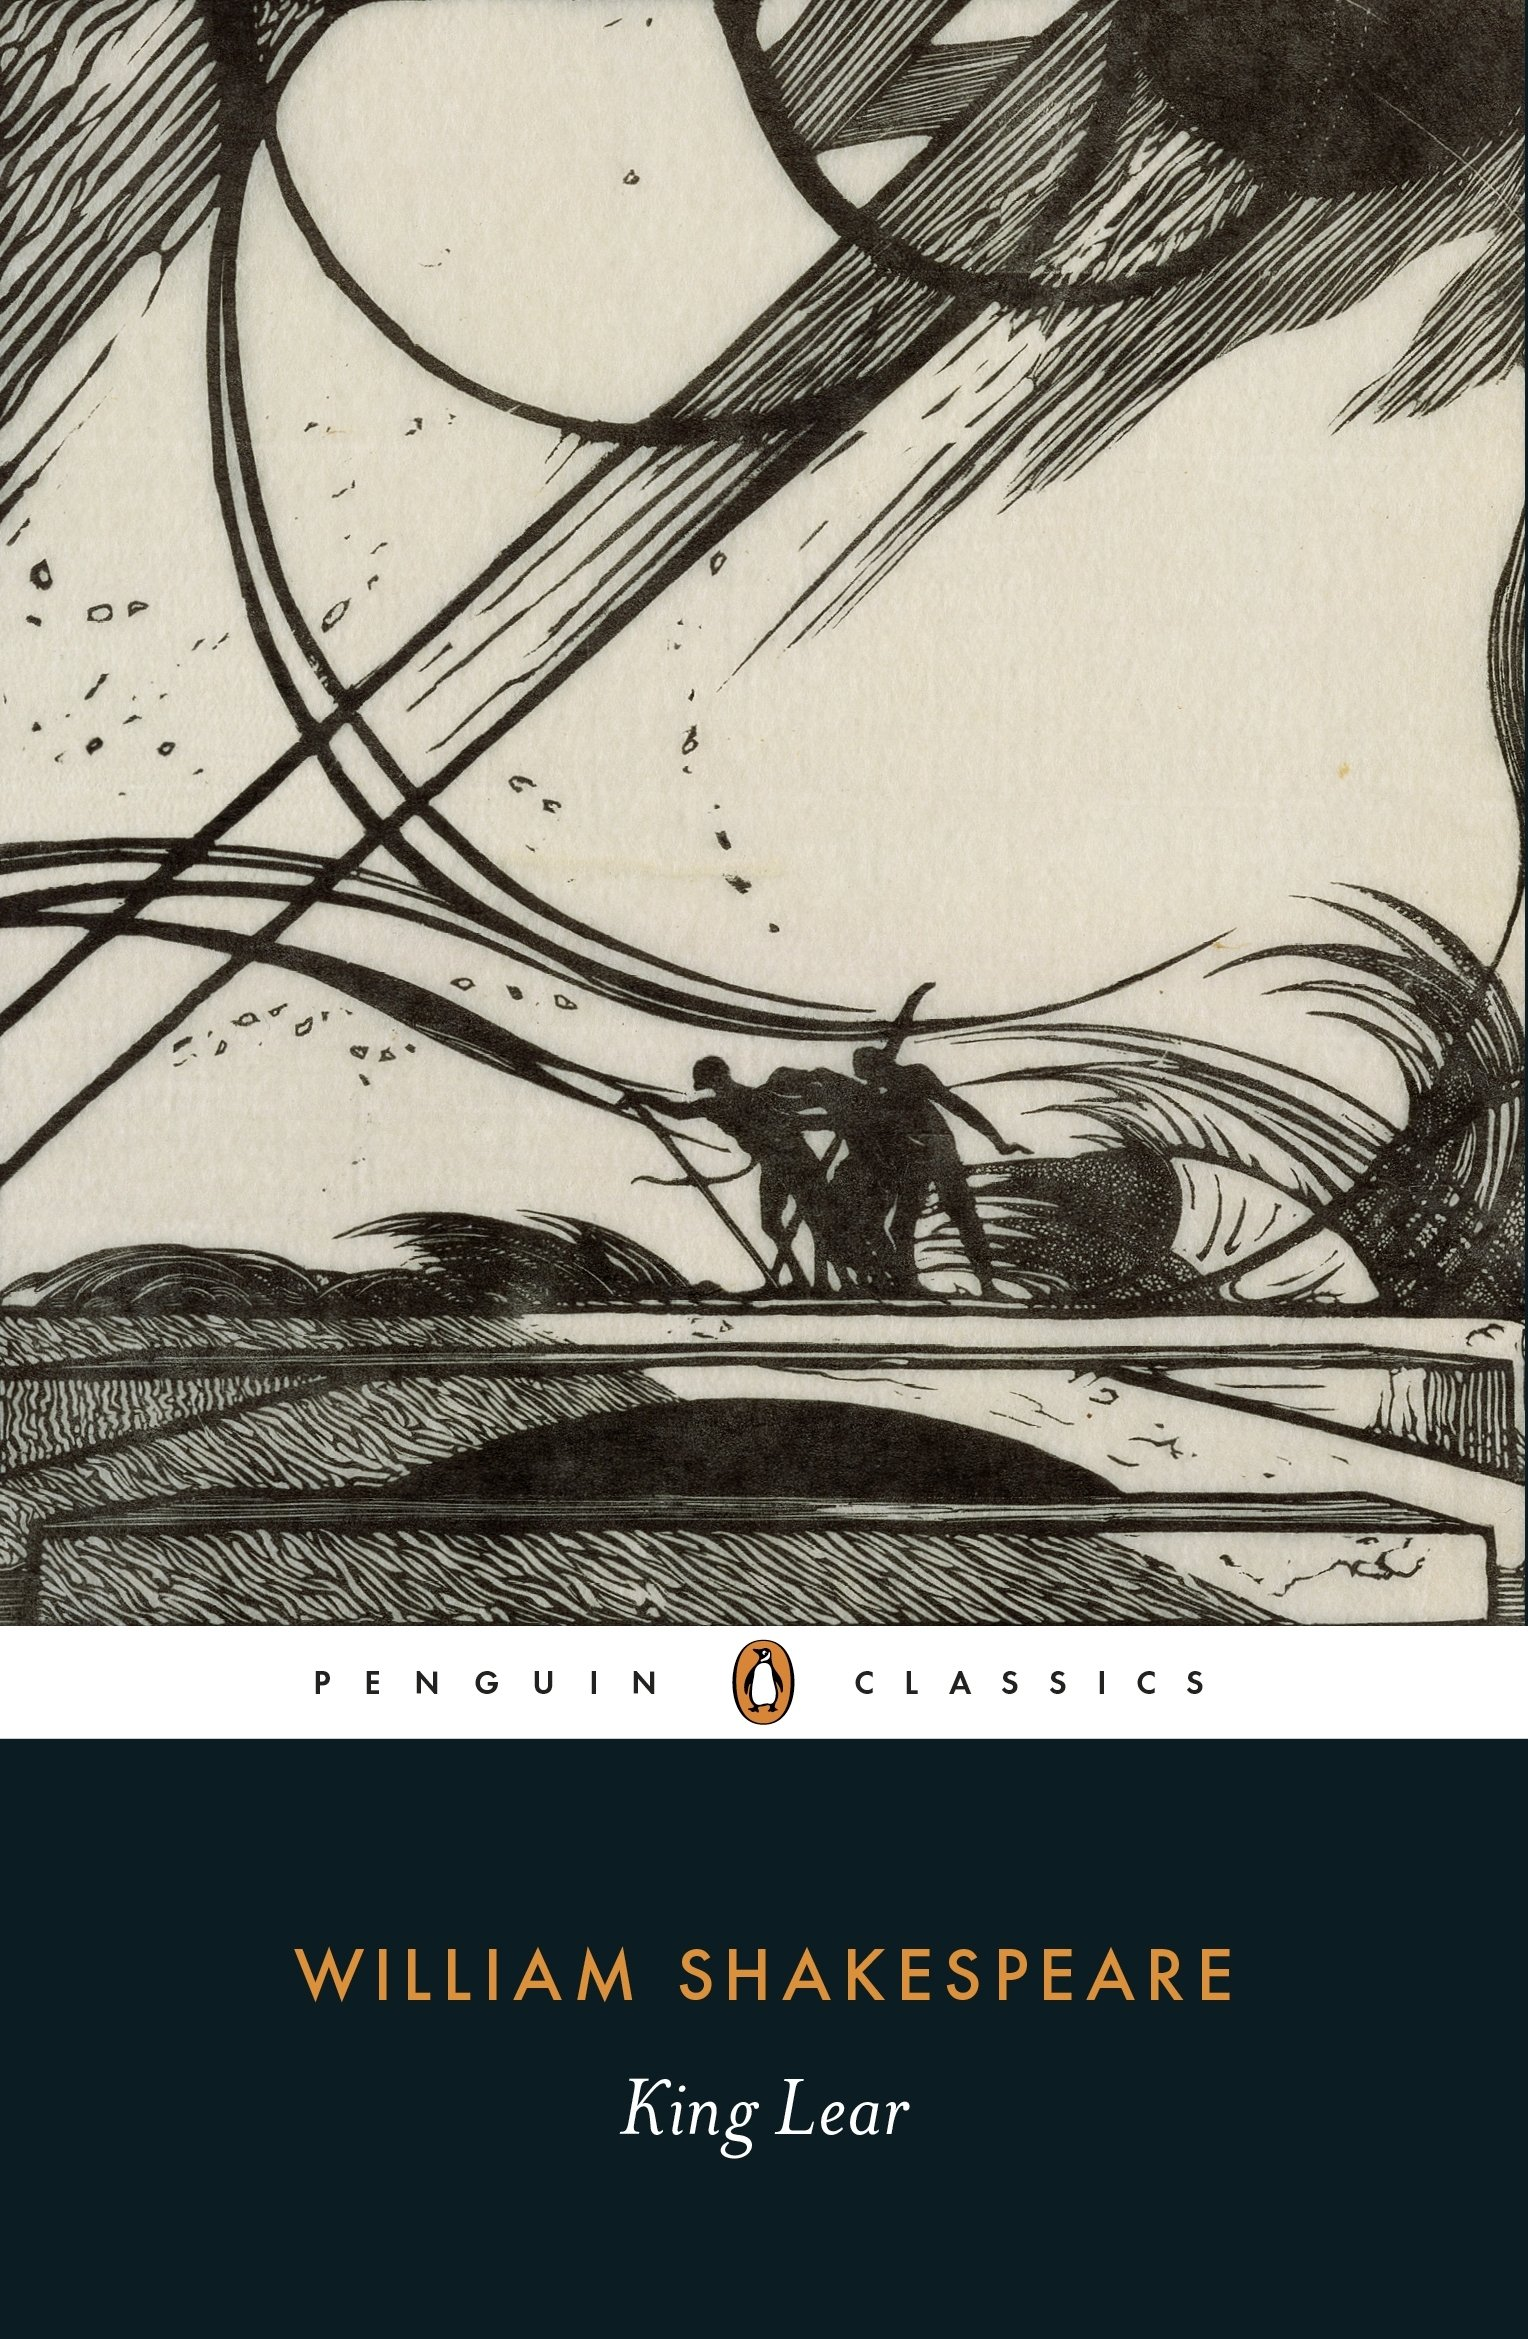 King Lear (Penguin Classics): Amazon.co.uk: William Shakespeare, Kiernan  Ryan: Books